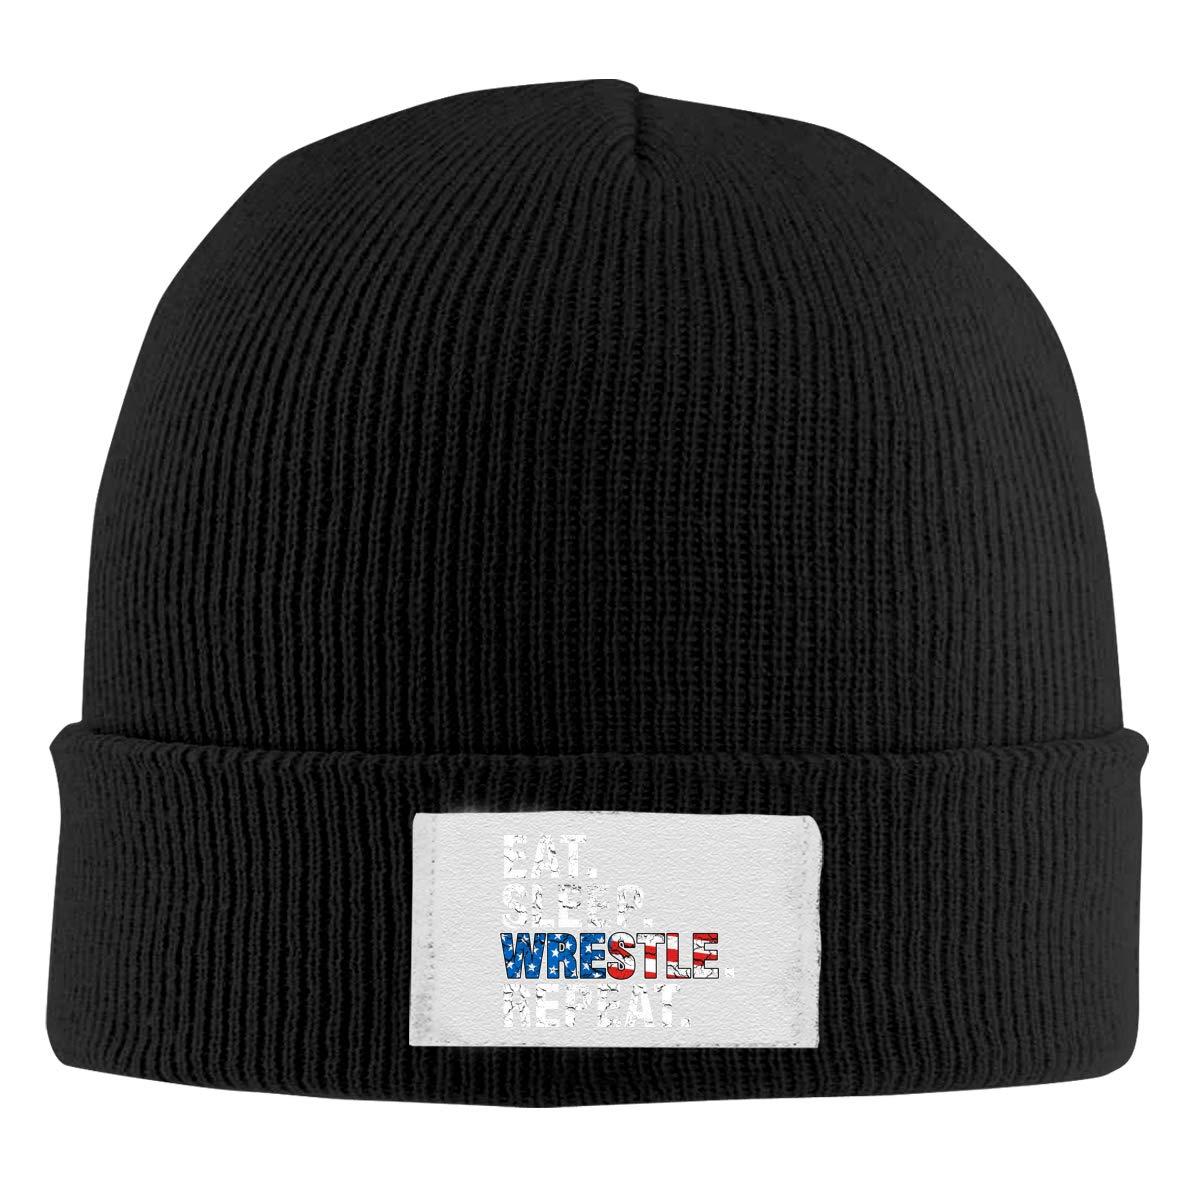 Stretchy Cuff Beanie Hat Black Dunpaiaa Skull Caps Eat Sleep Wrestle Repeat Wrestling Winter Warm Knit Hats